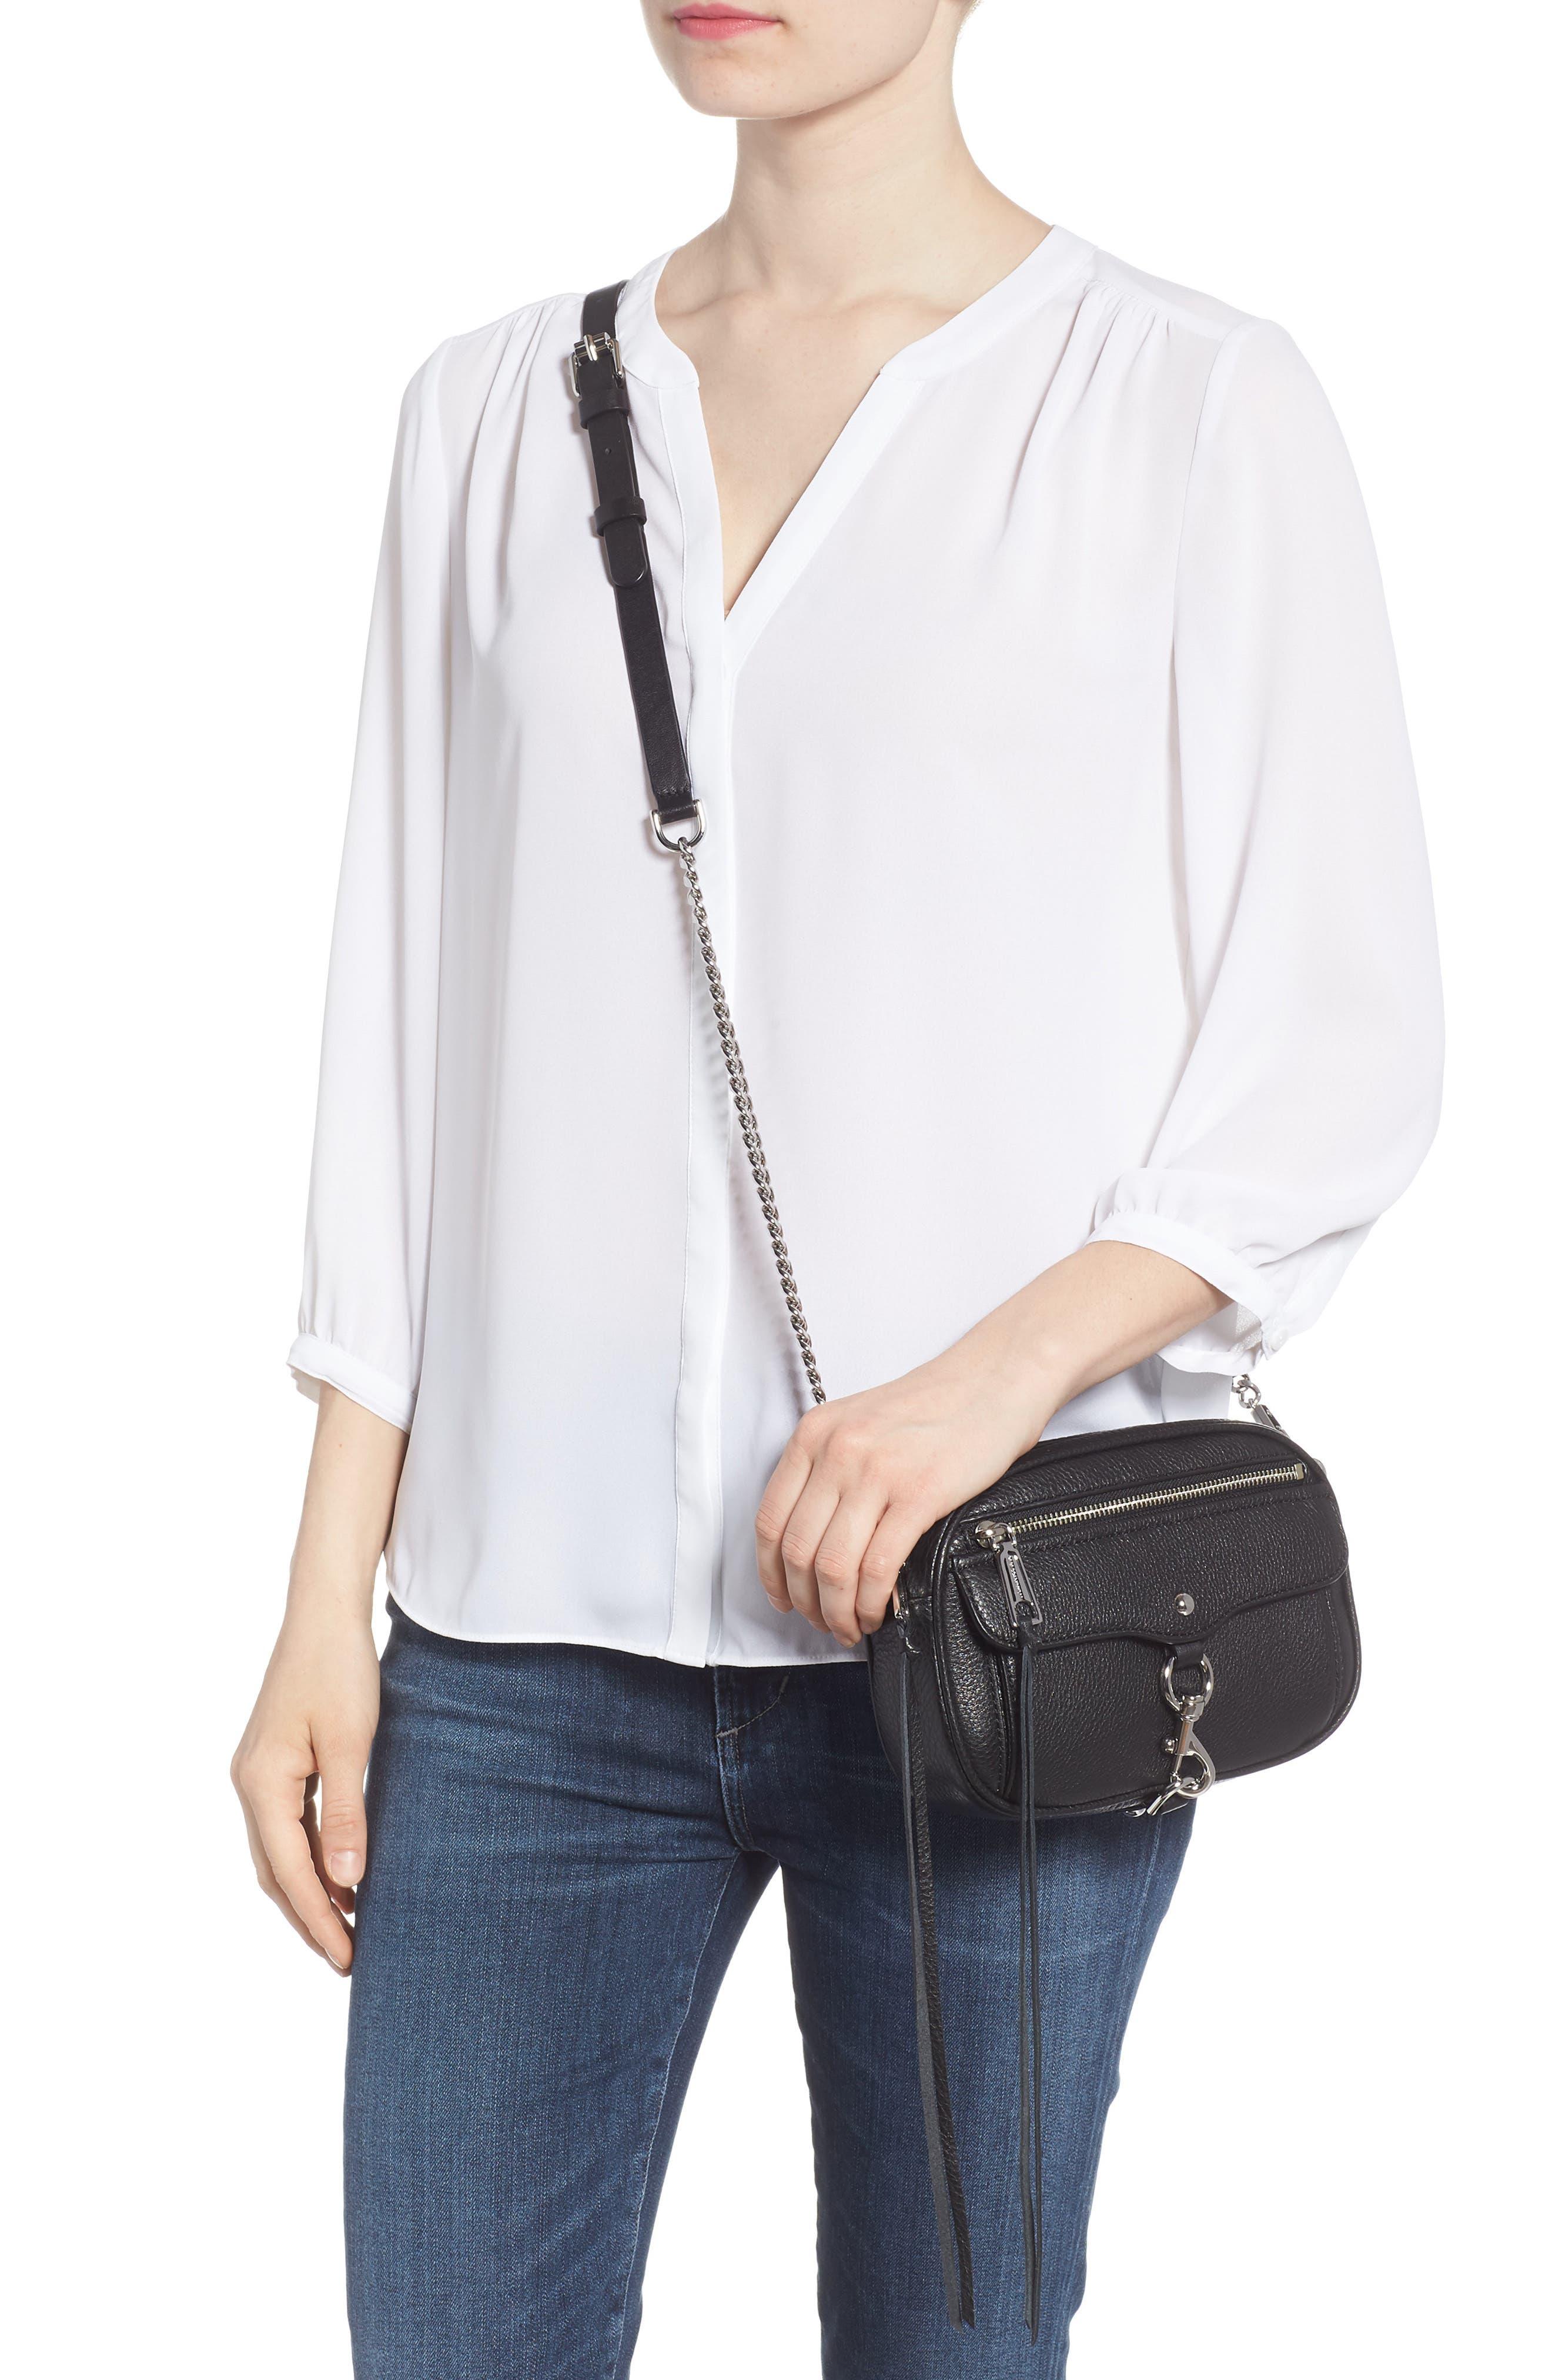 REBECCA MINKOFF, Blythe Leather Crossbody Bag, Alternate thumbnail 2, color, BLACK